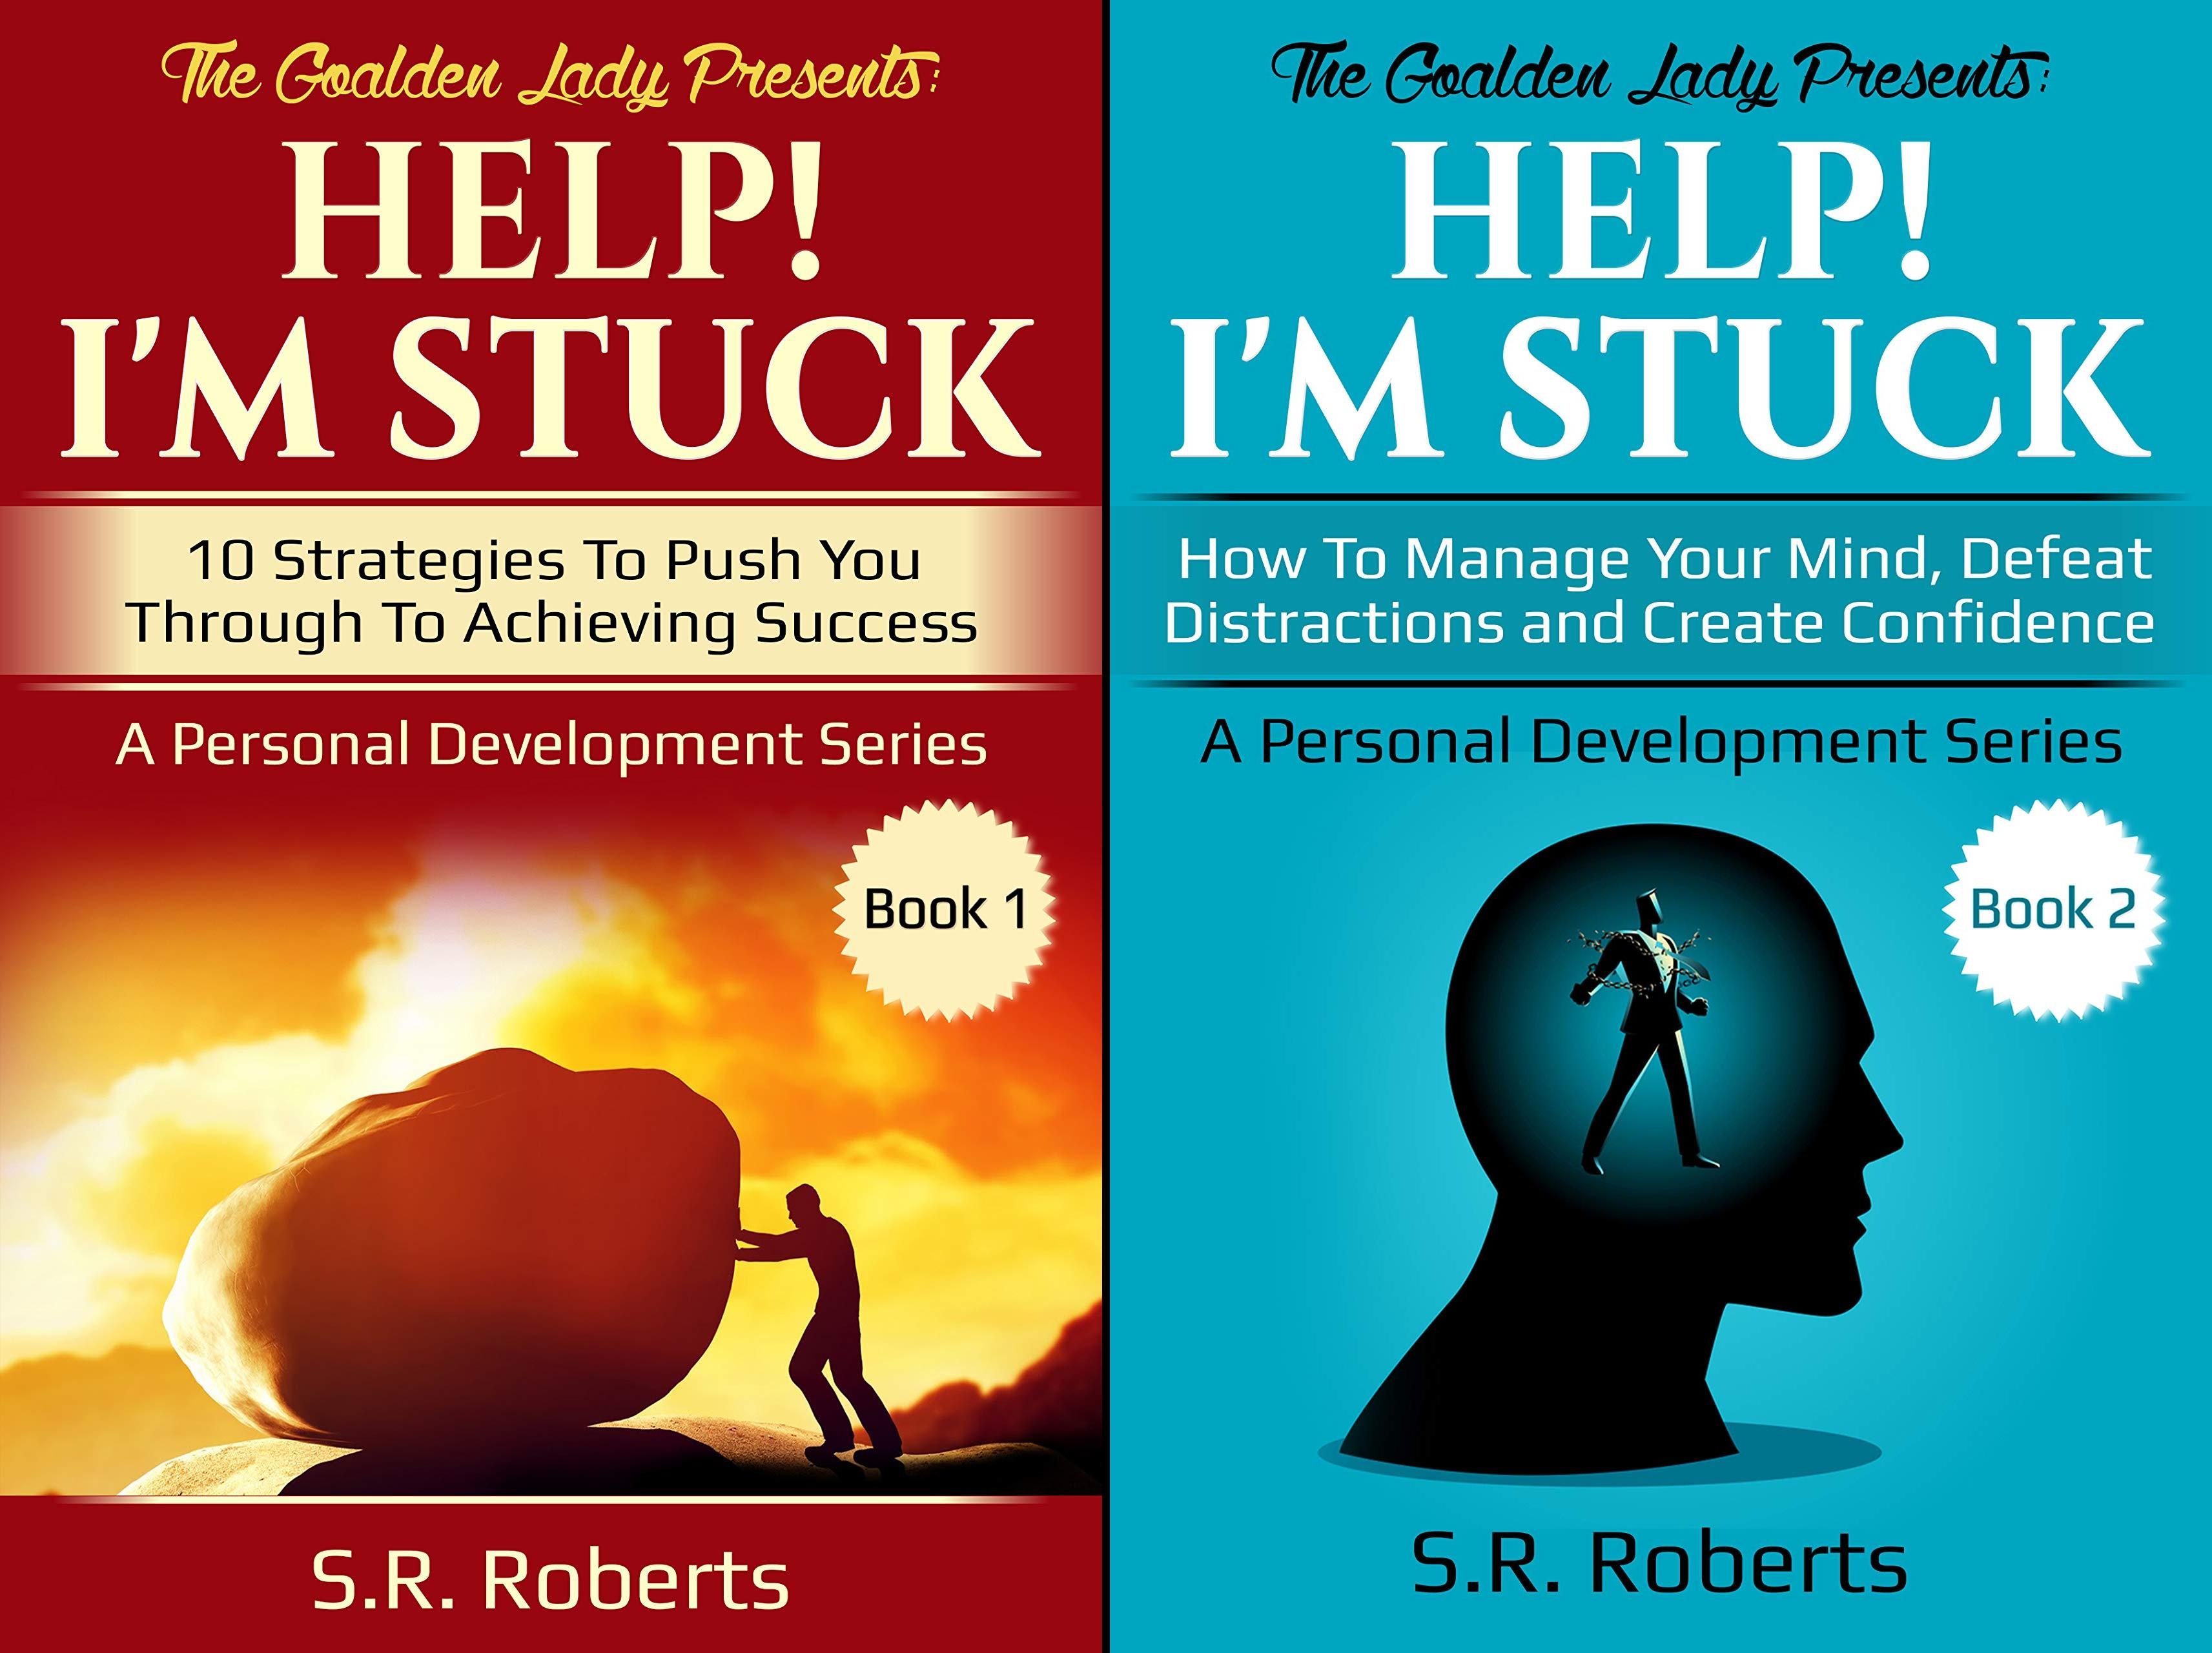 Help! I'm Stuck (2 Book Series)